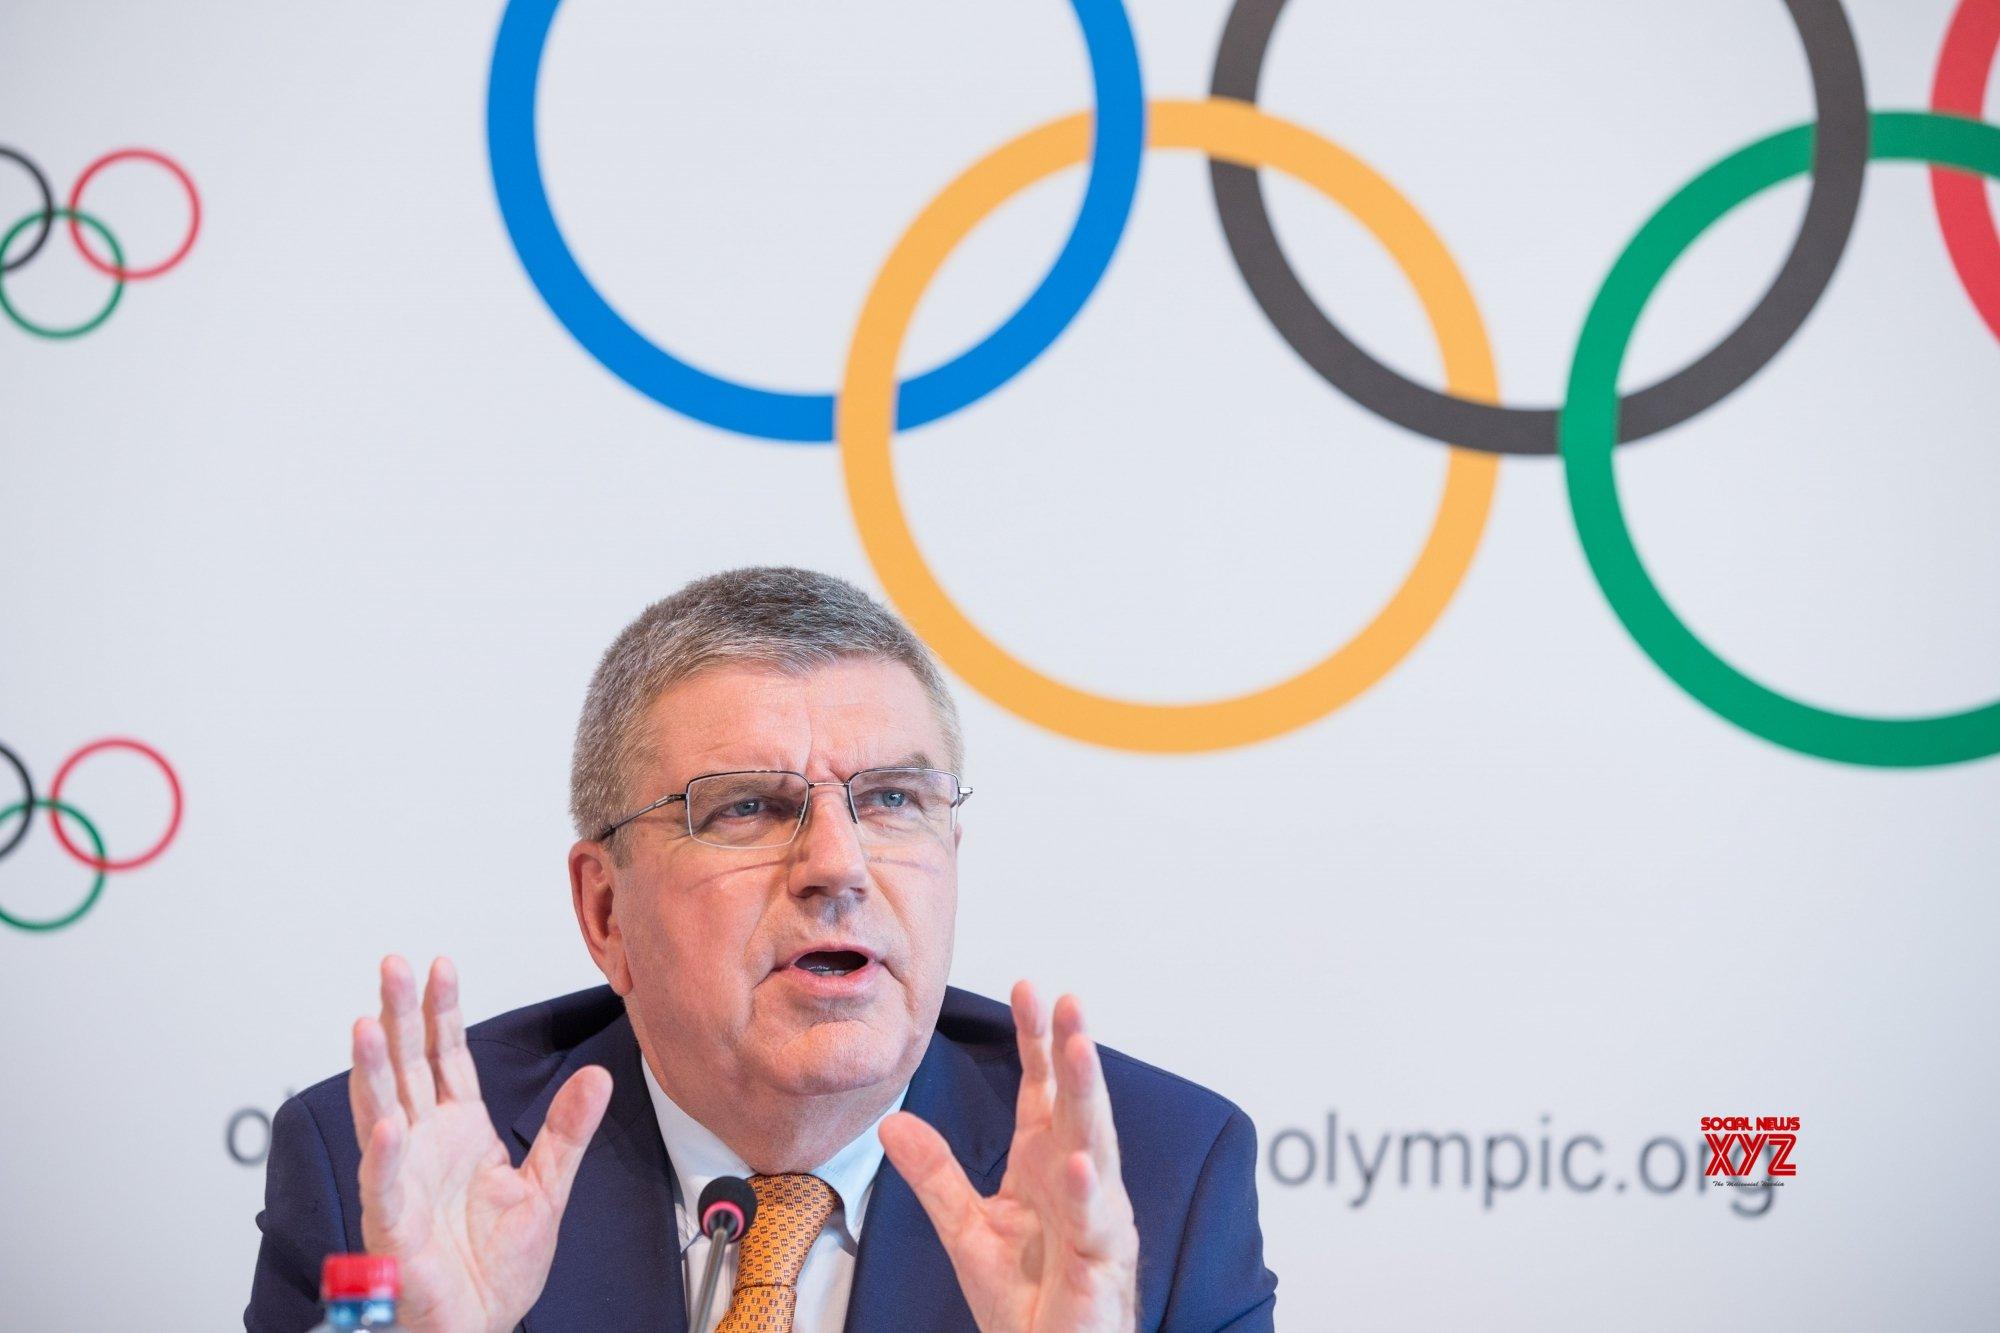 2022 Dakar Youth Olympics postponed to 2026